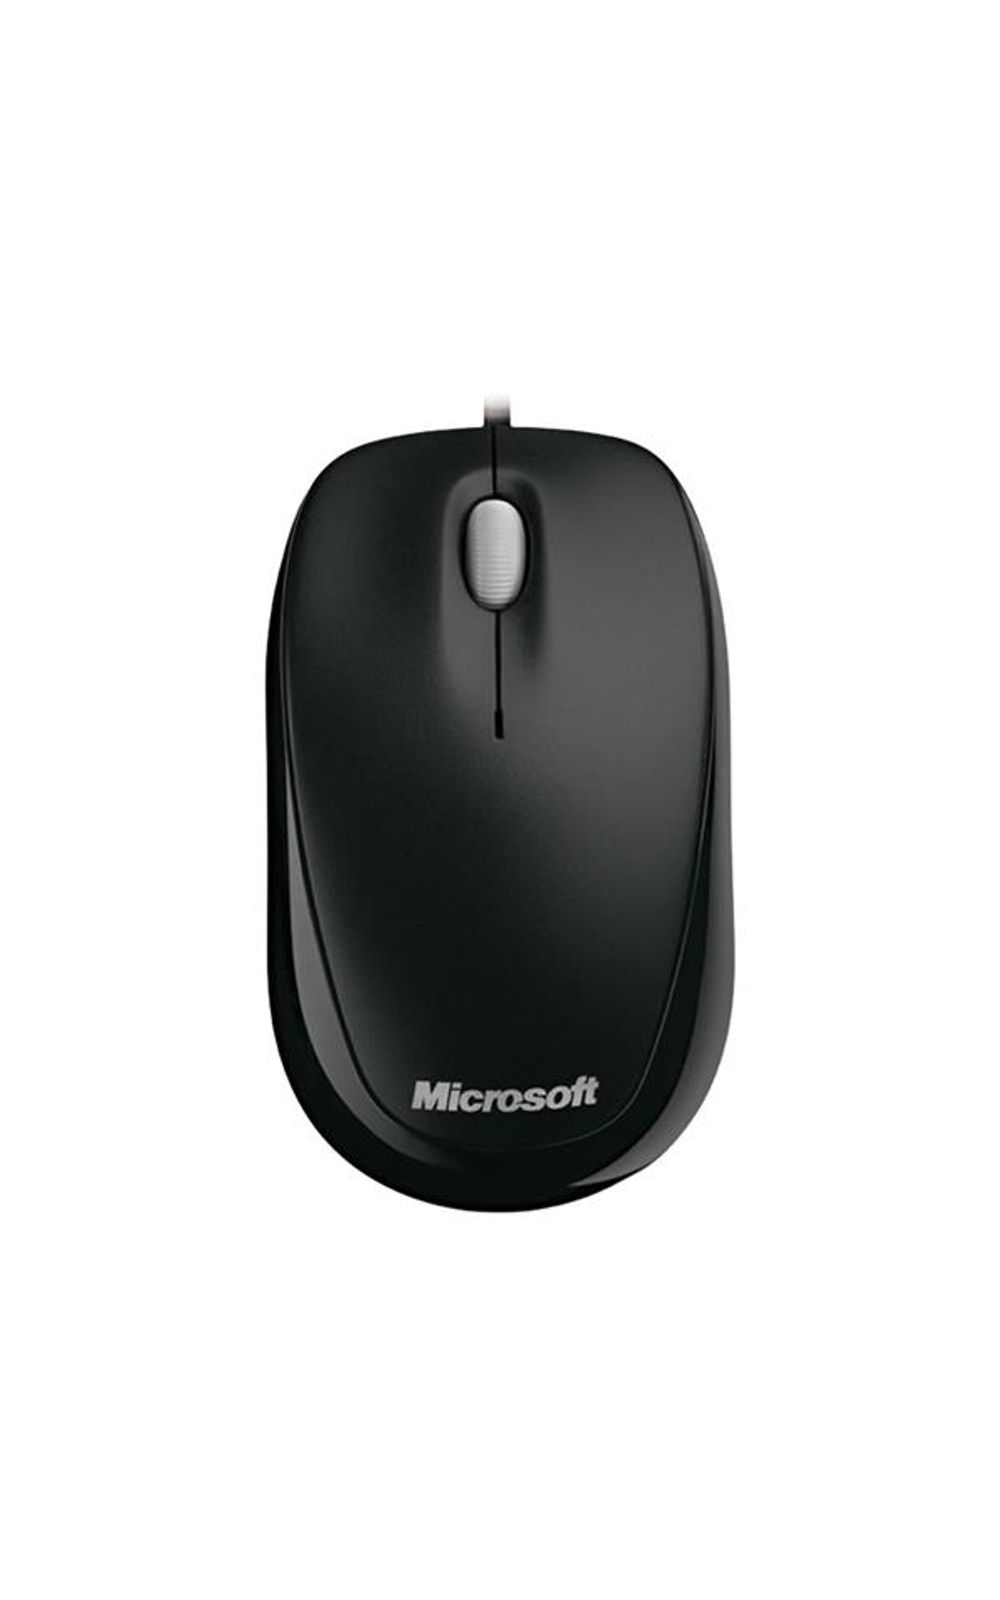 Foto 5 - Mouse Com Fio Compact Usb Preto Microsoft - U8100010